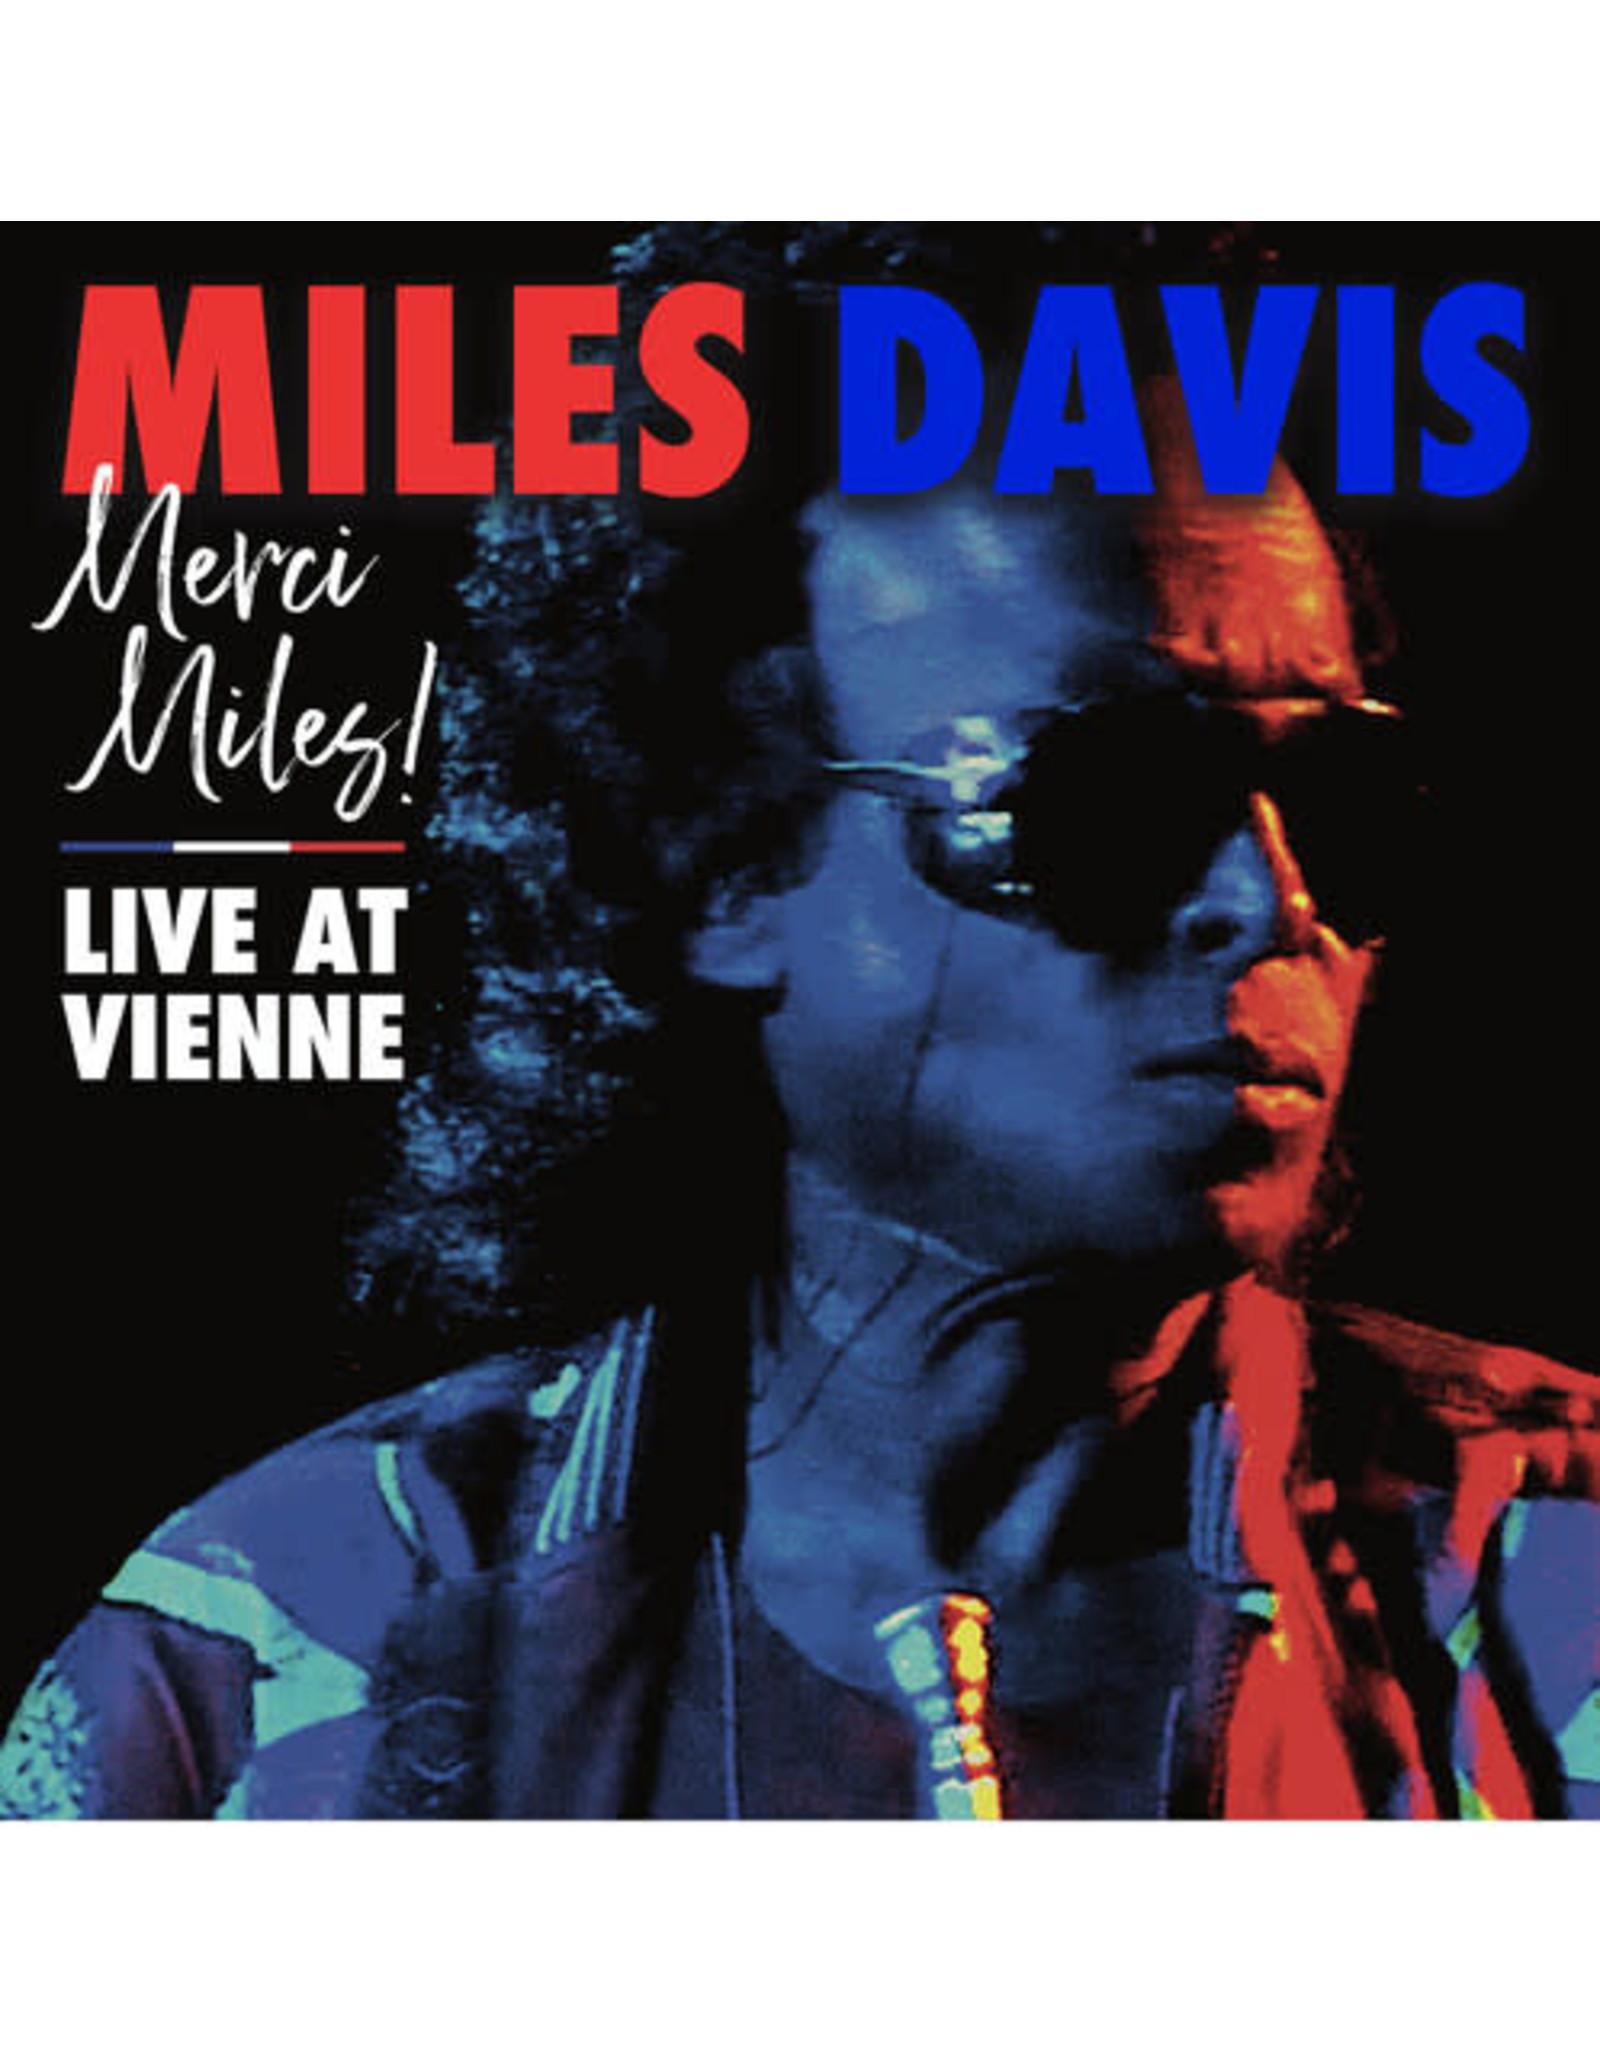 New Vinyl Miles Davis - Merci, Miles! Live At Vienne 2LP